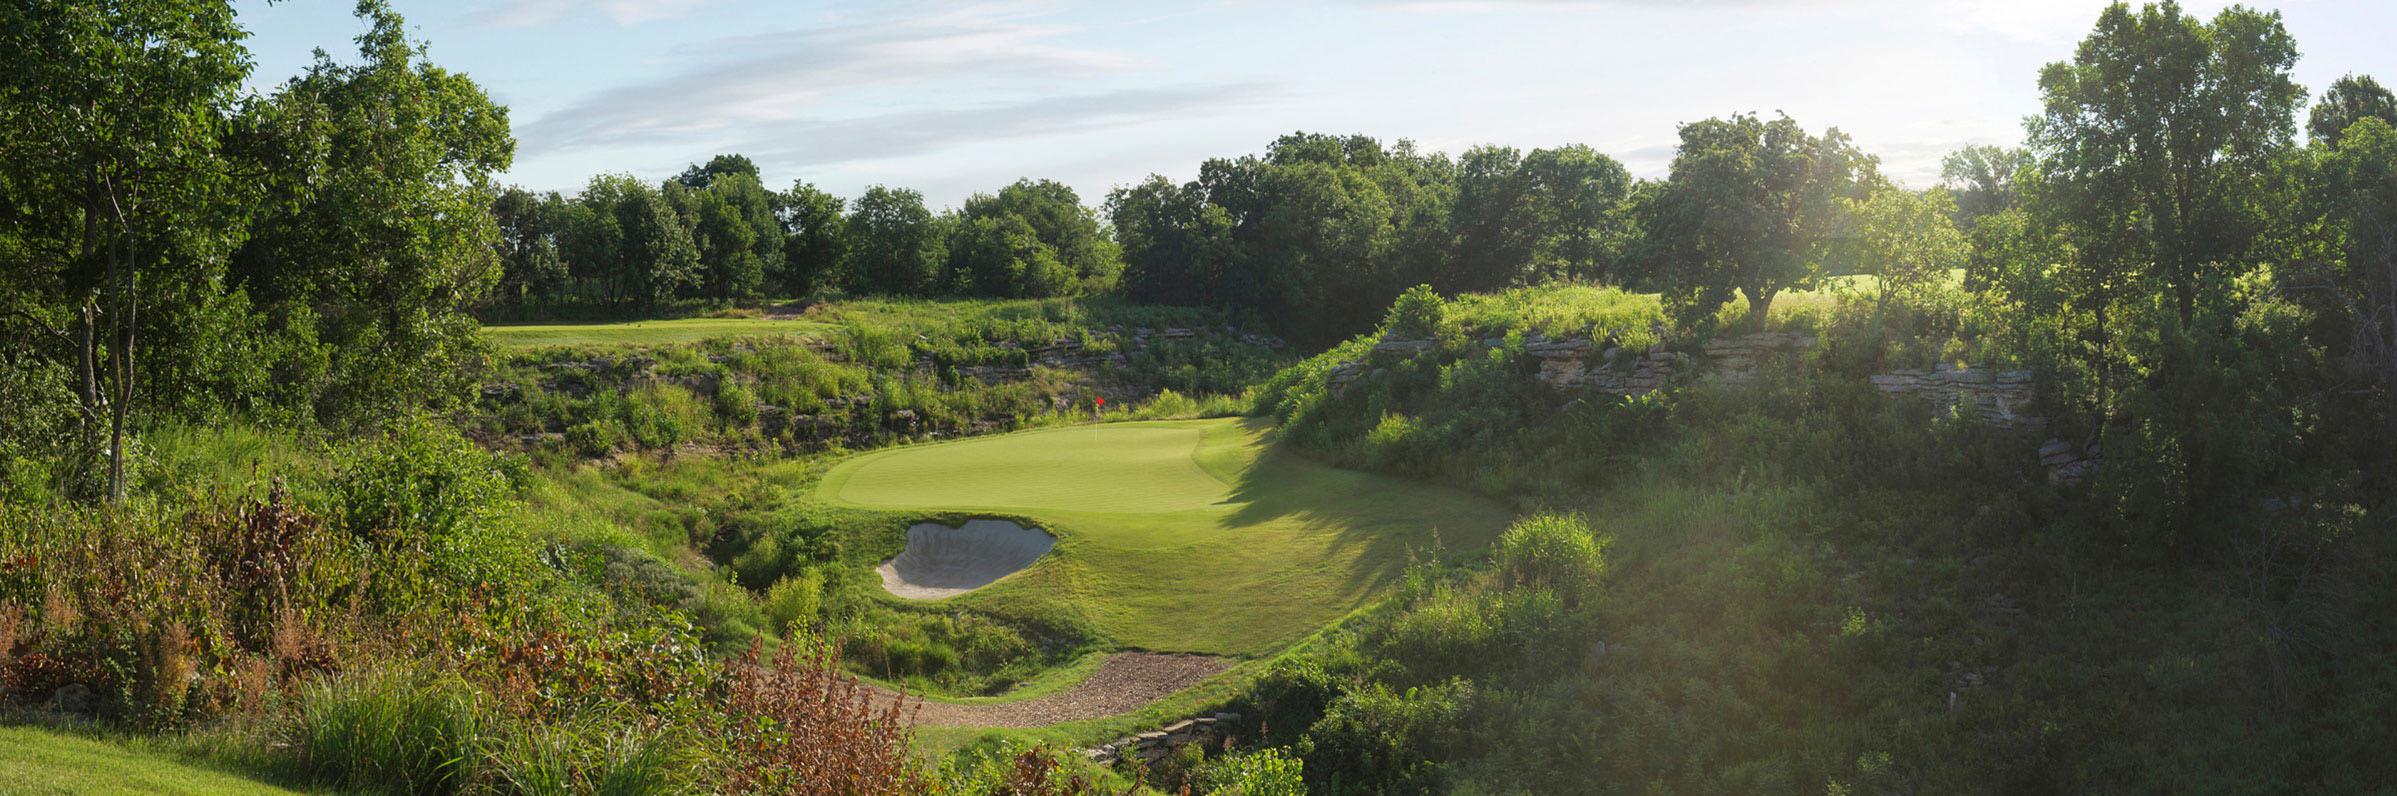 Golf Course Image - Patriot No. 6B